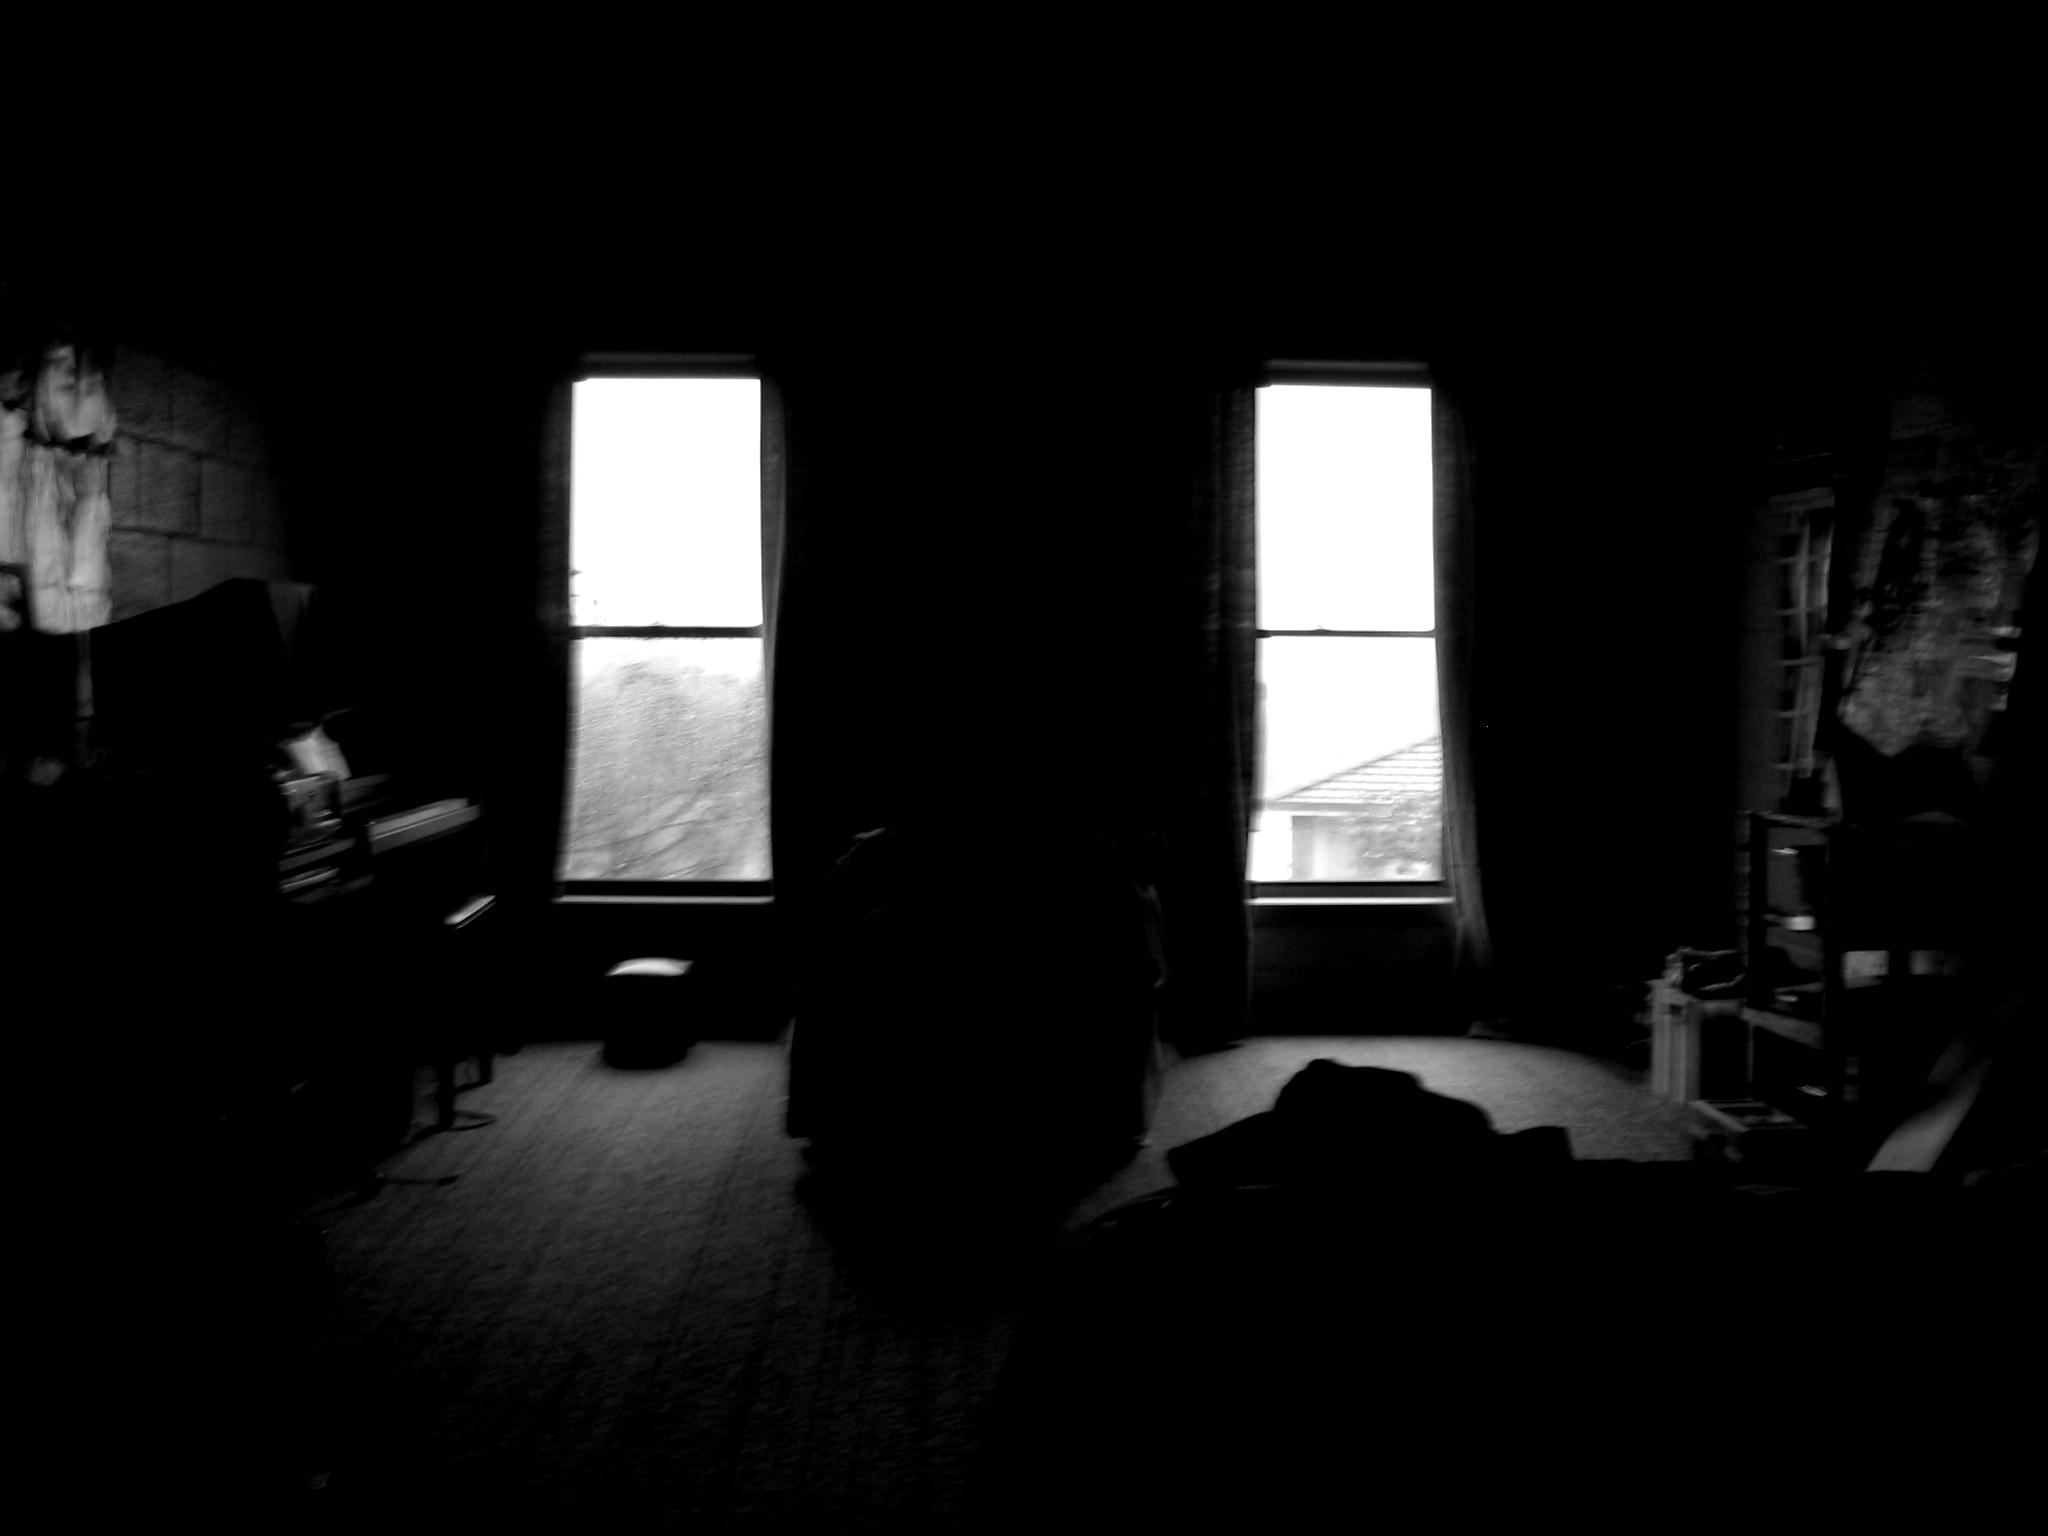 Dark empty room with window - Dark Room And Windows Ii By Jesseginadark Empty Room With Window